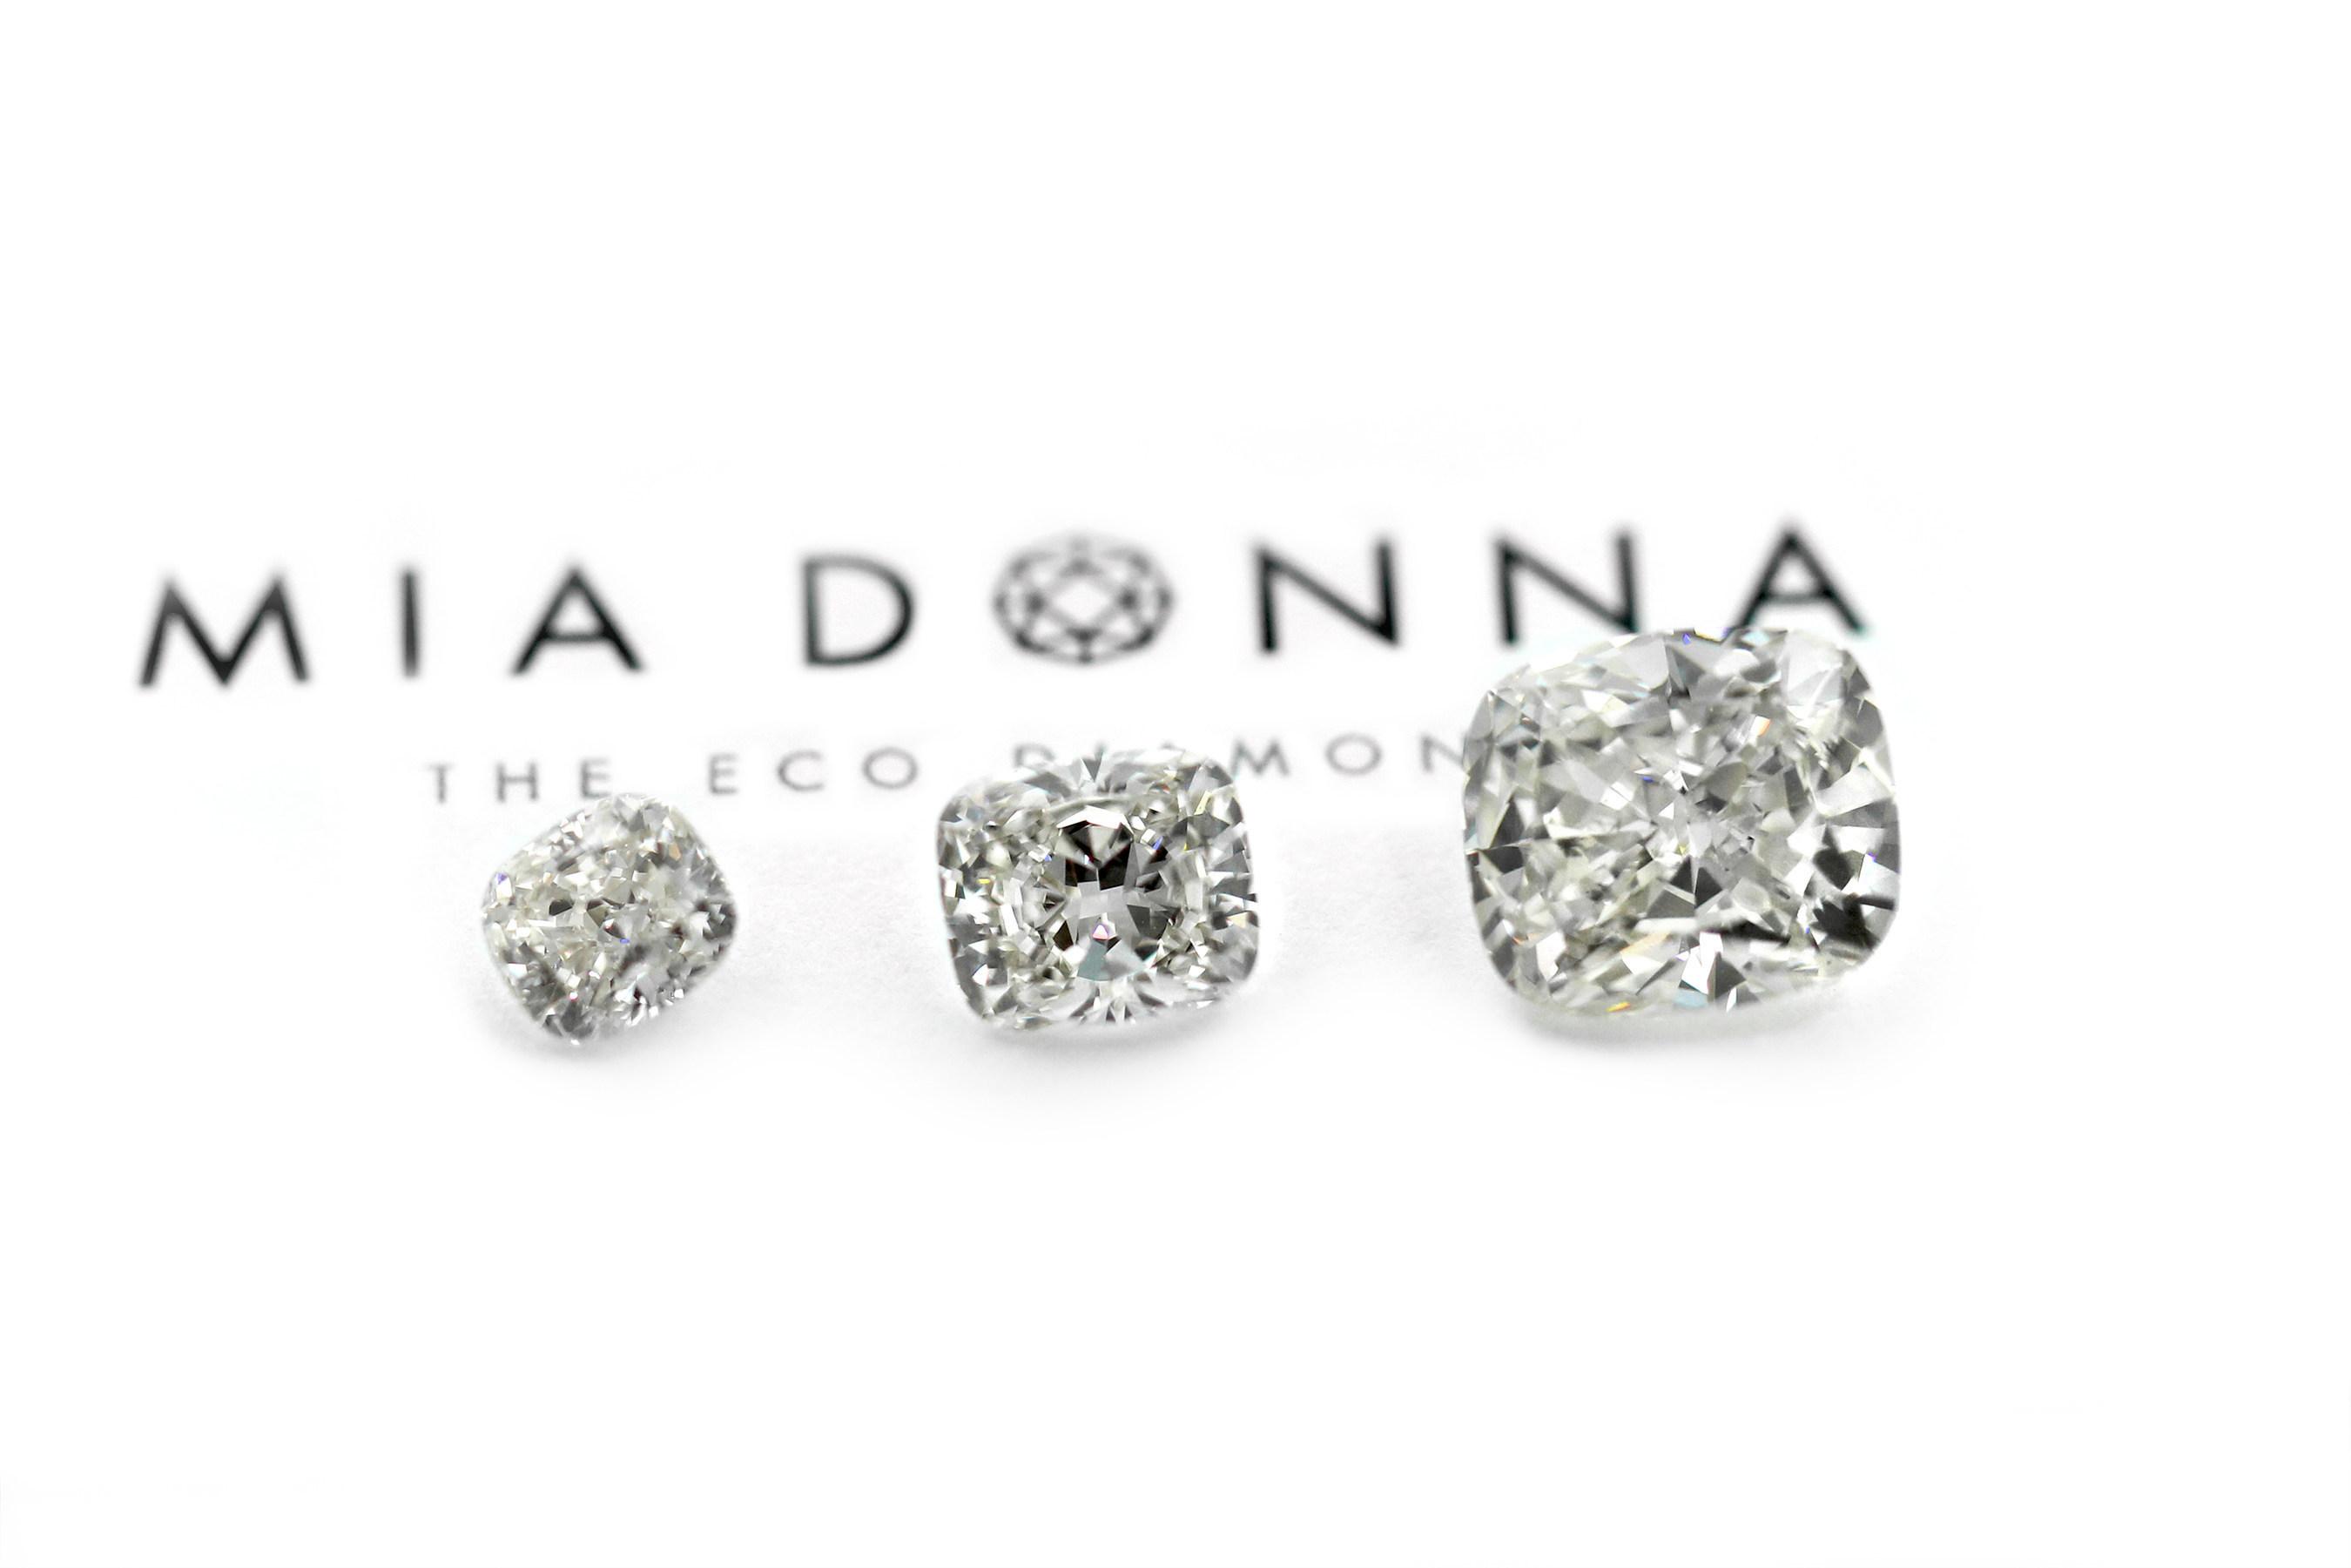 6.28 Carat MiaDonna & Company Largest Grown-in-the-USA Laboratory Diamond, next to 3 carat and 2 carat stones